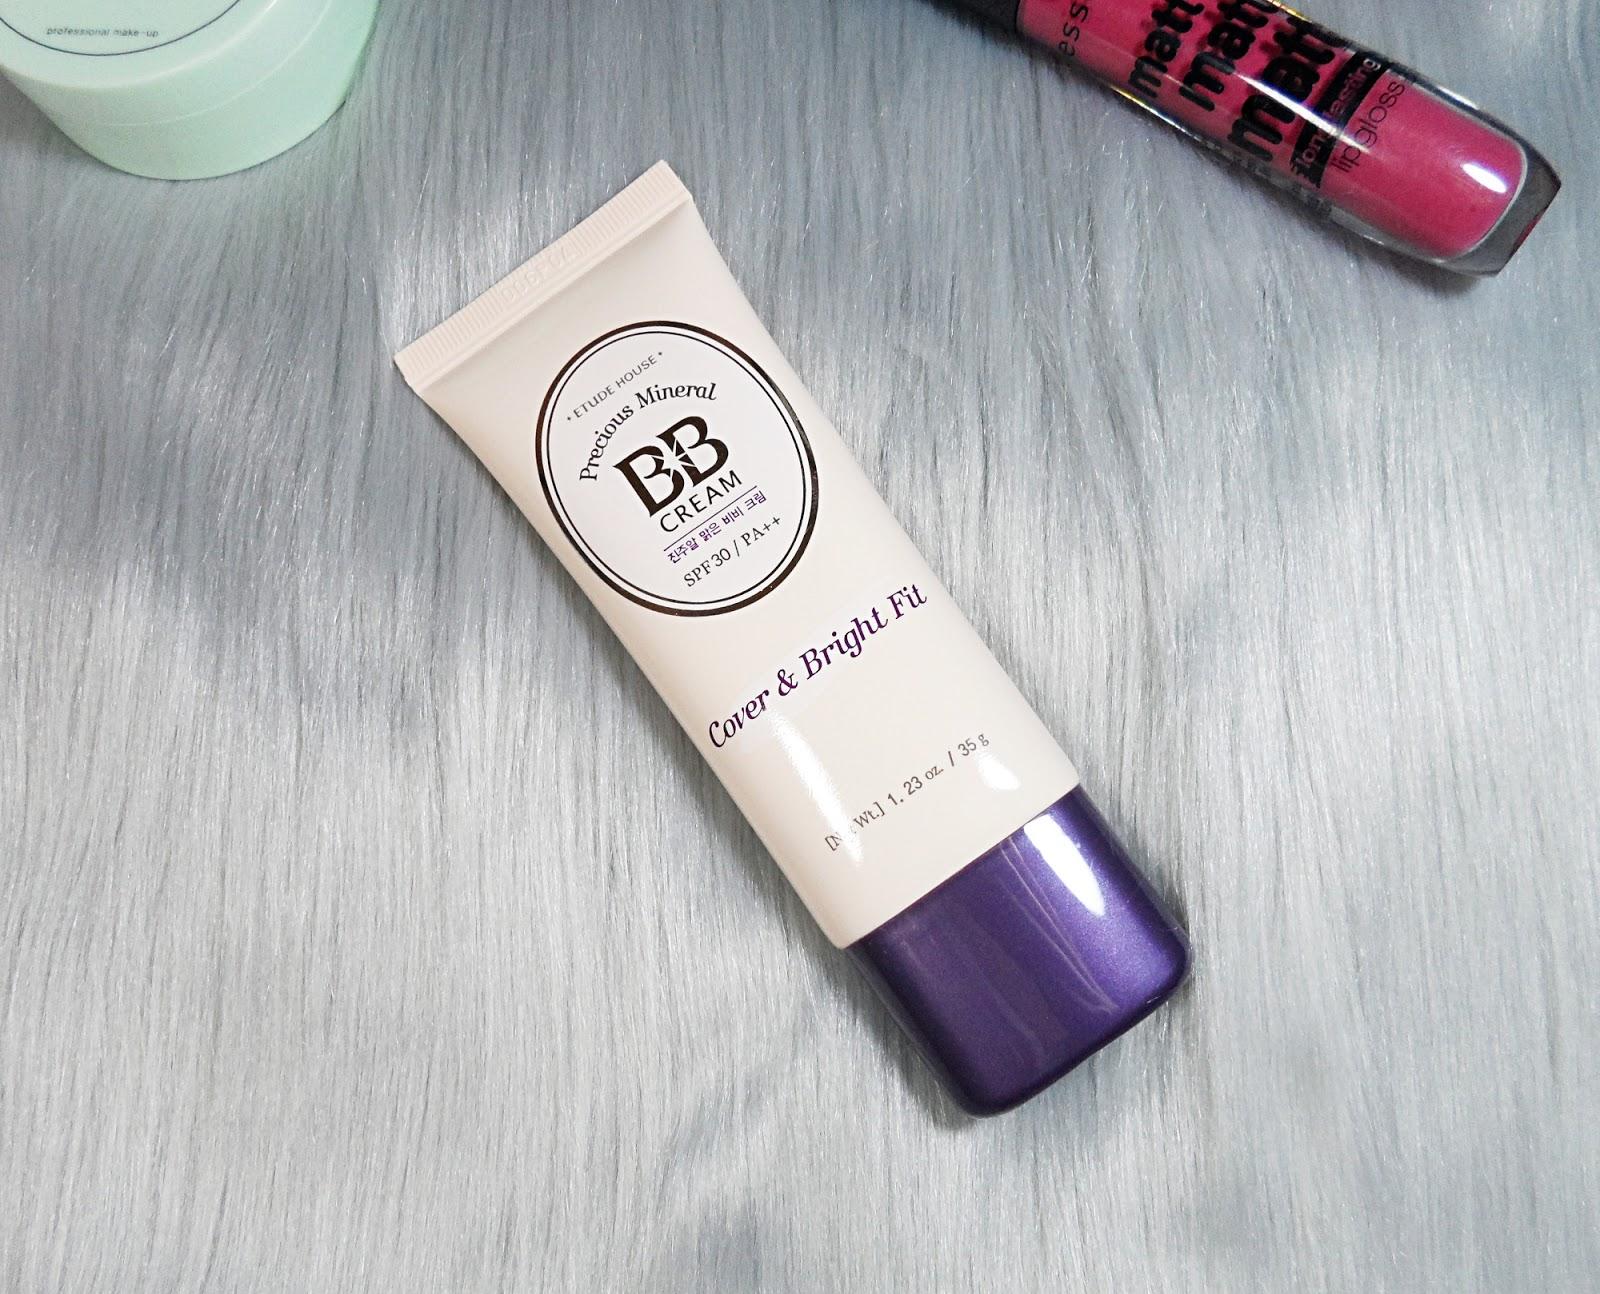 liz breygel korean korean makeup beauty products blogger review swatches